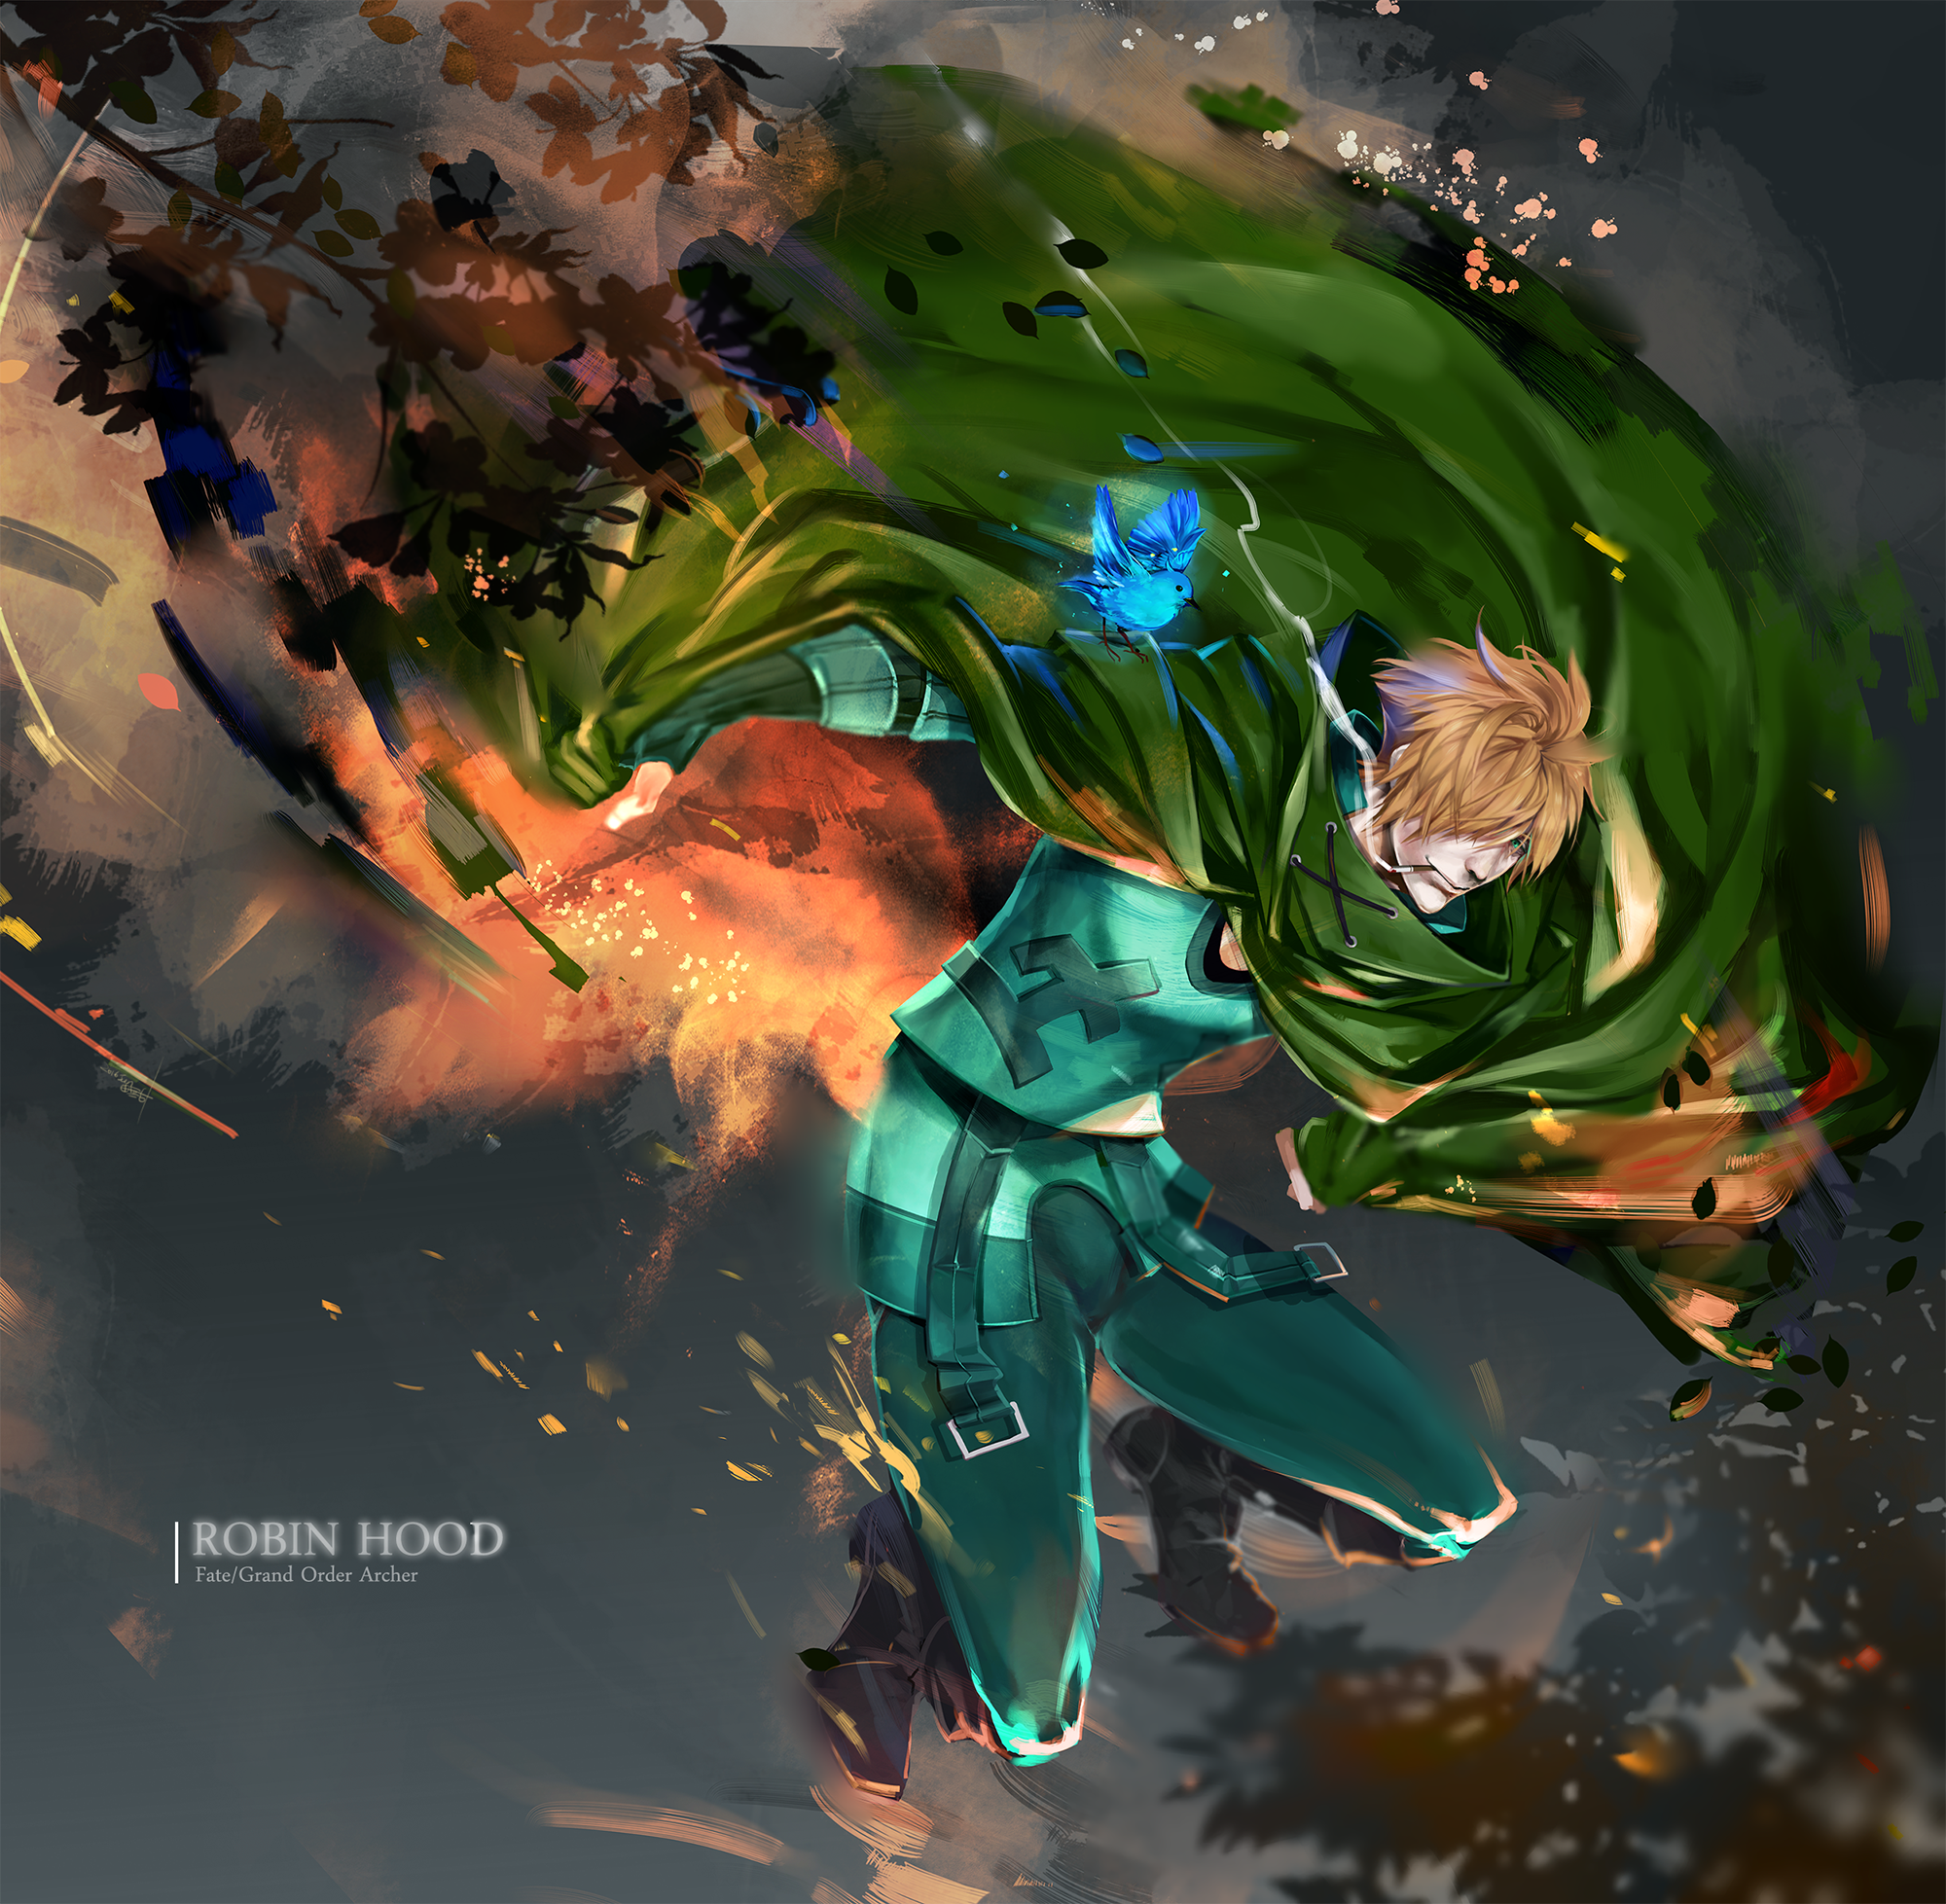 Robin Hood / Lost Robin Rondo【Fate/Grand Order】 Anime